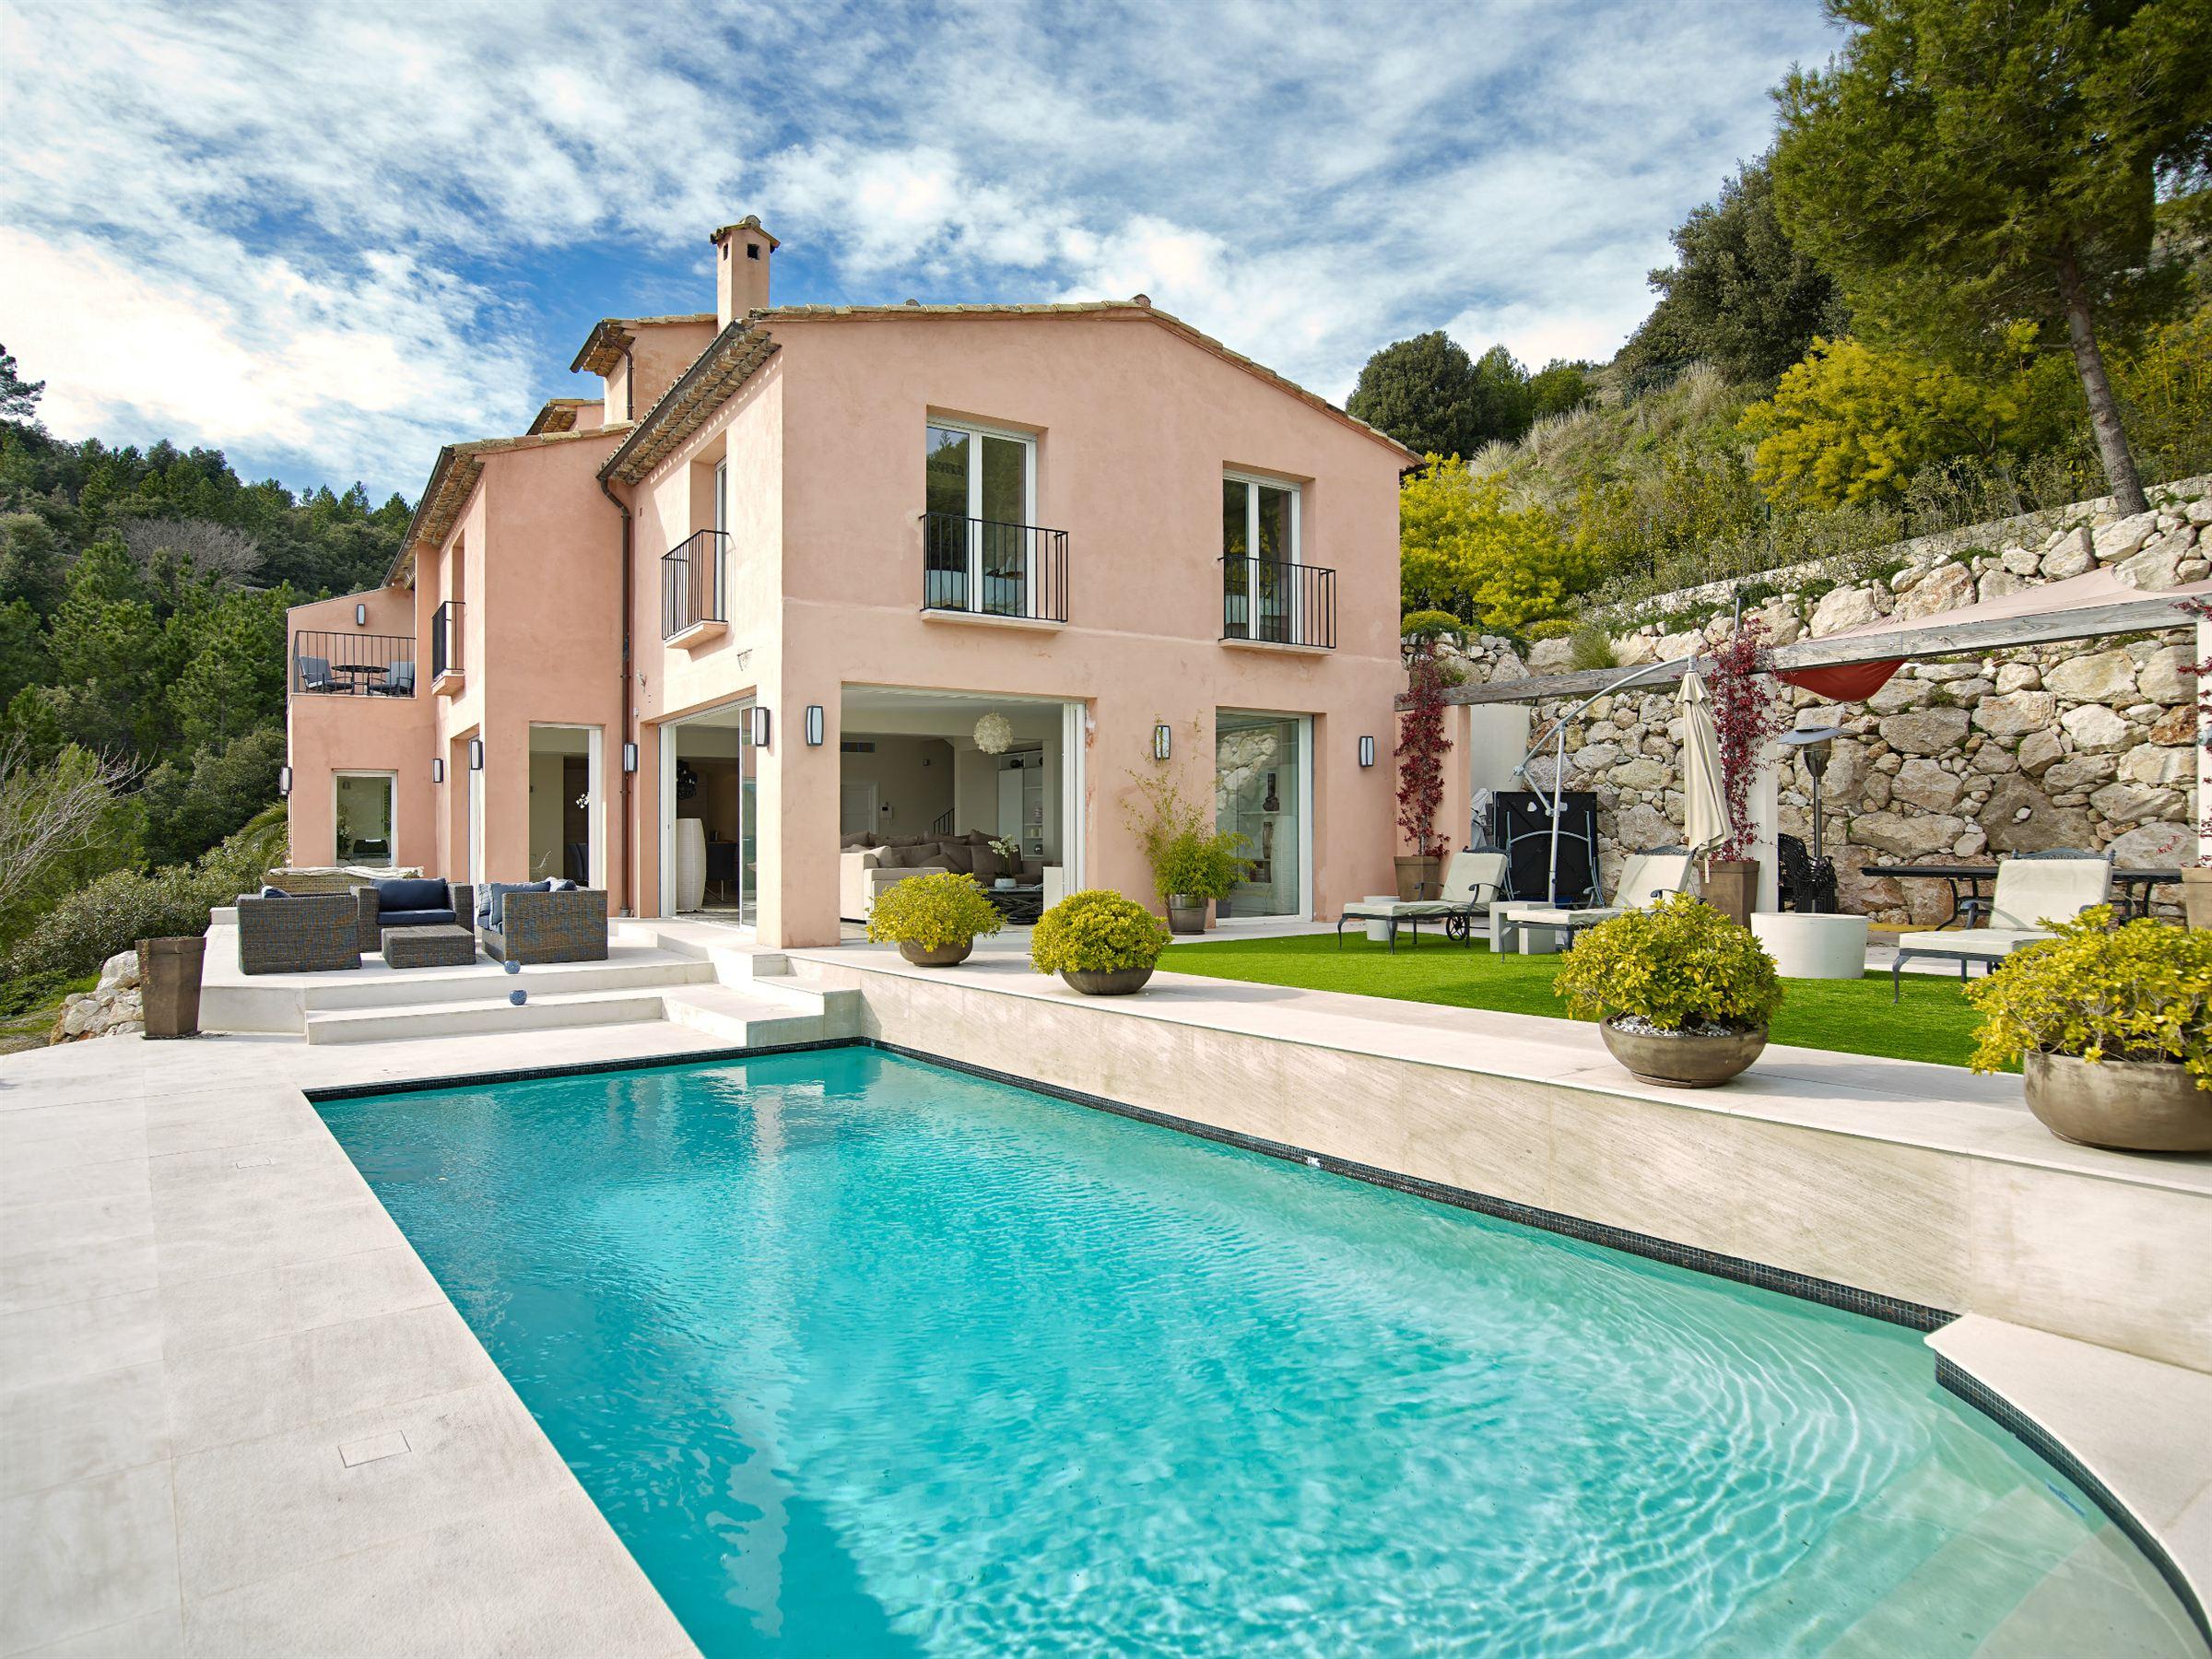 獨棟家庭住宅 為 出售 在 Provencal style villa with panoramic sea view overlooking Eze sur Mer Eze, 普羅旺斯阿爾卑斯藍色海岸 06360 法國